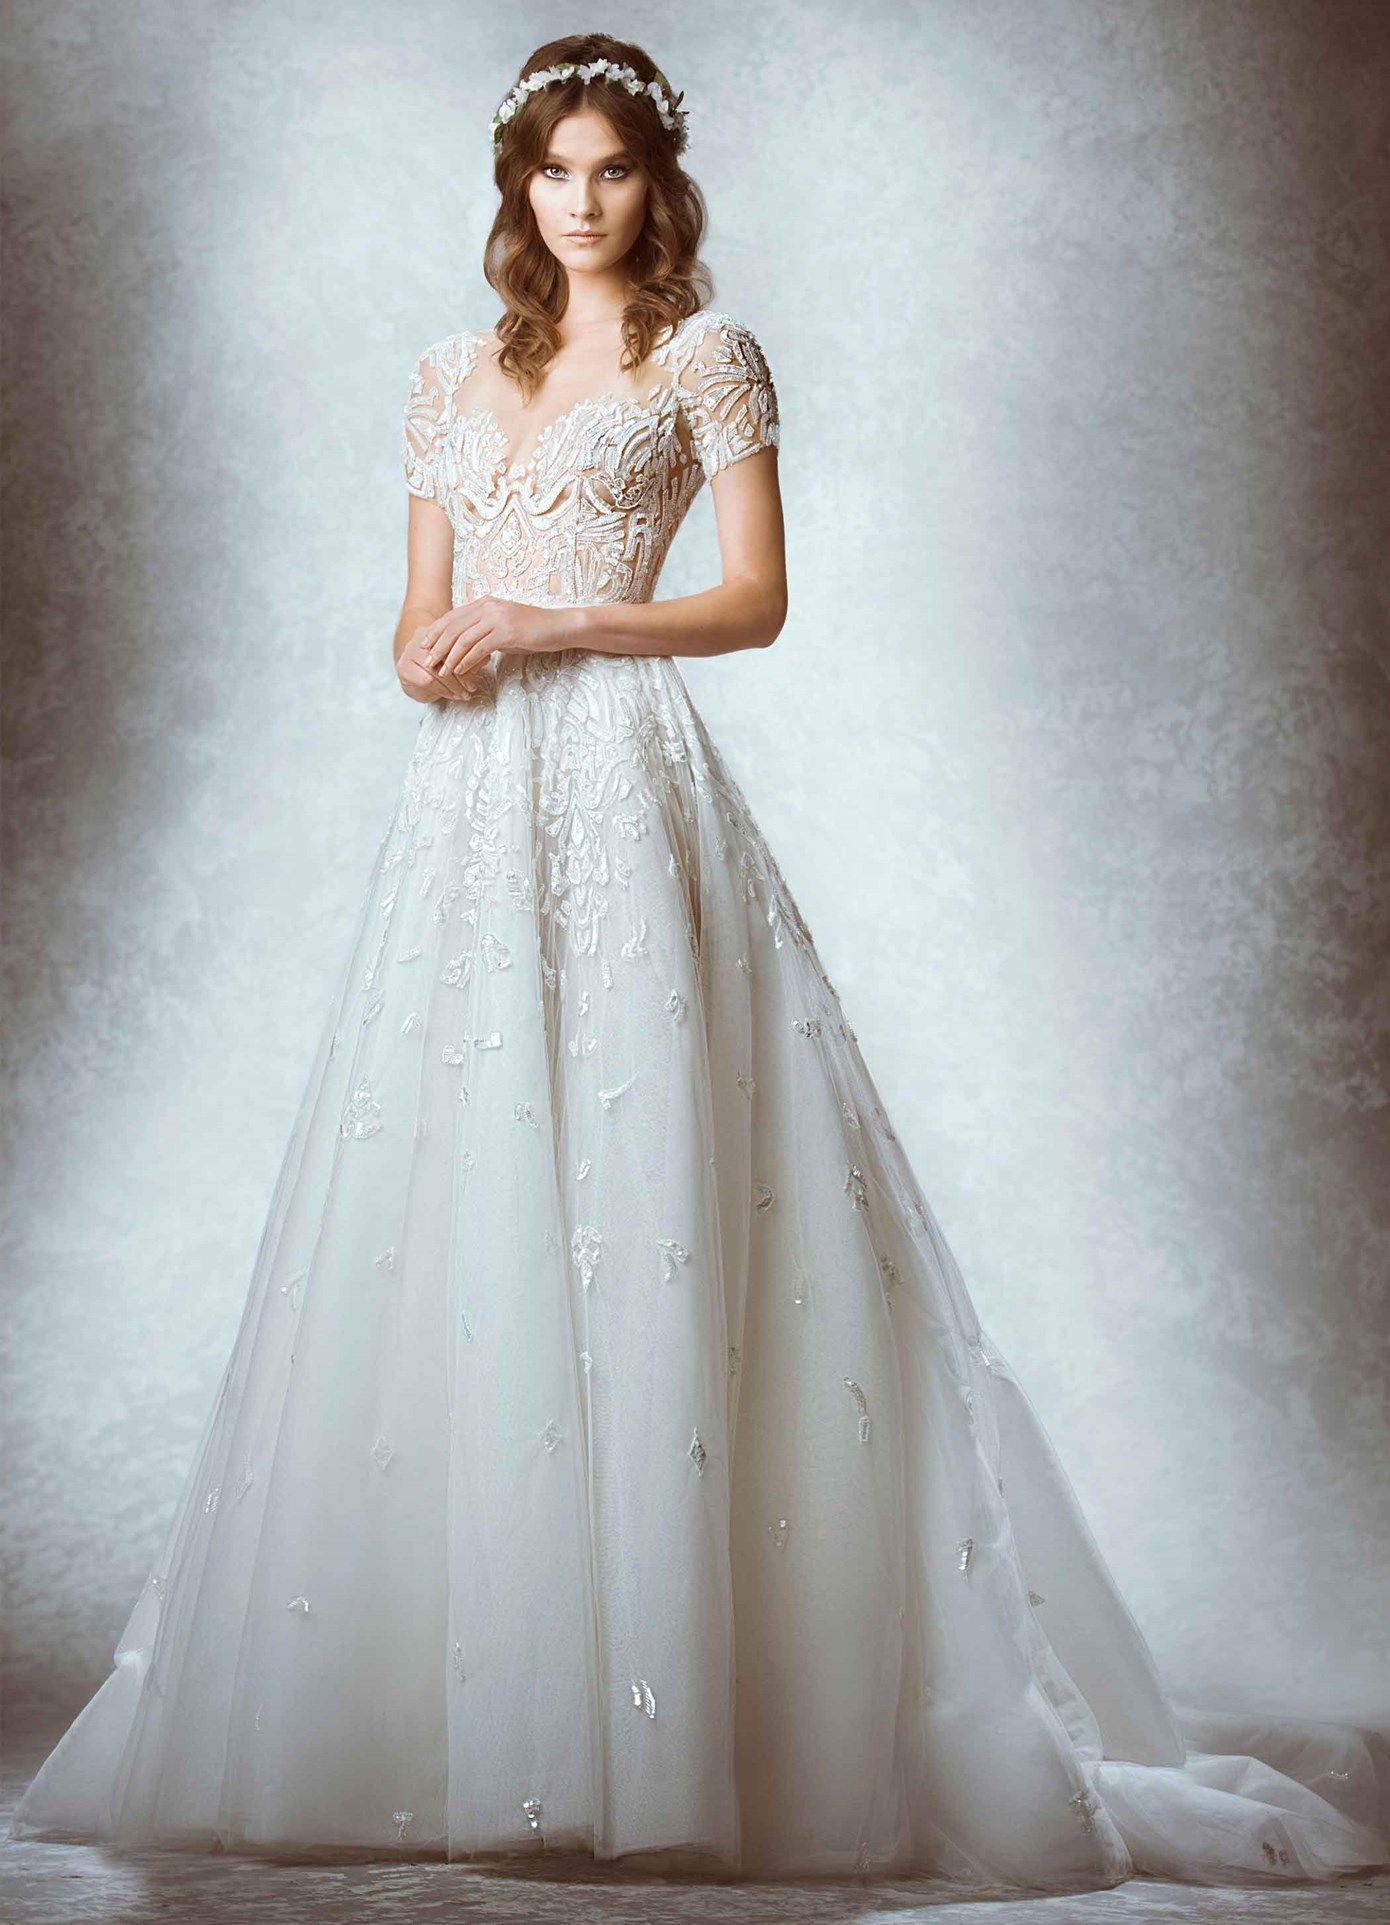 Bridal Fall 15 | Wedding Dresses 2015 | Pinterest | Perfect wedding ...